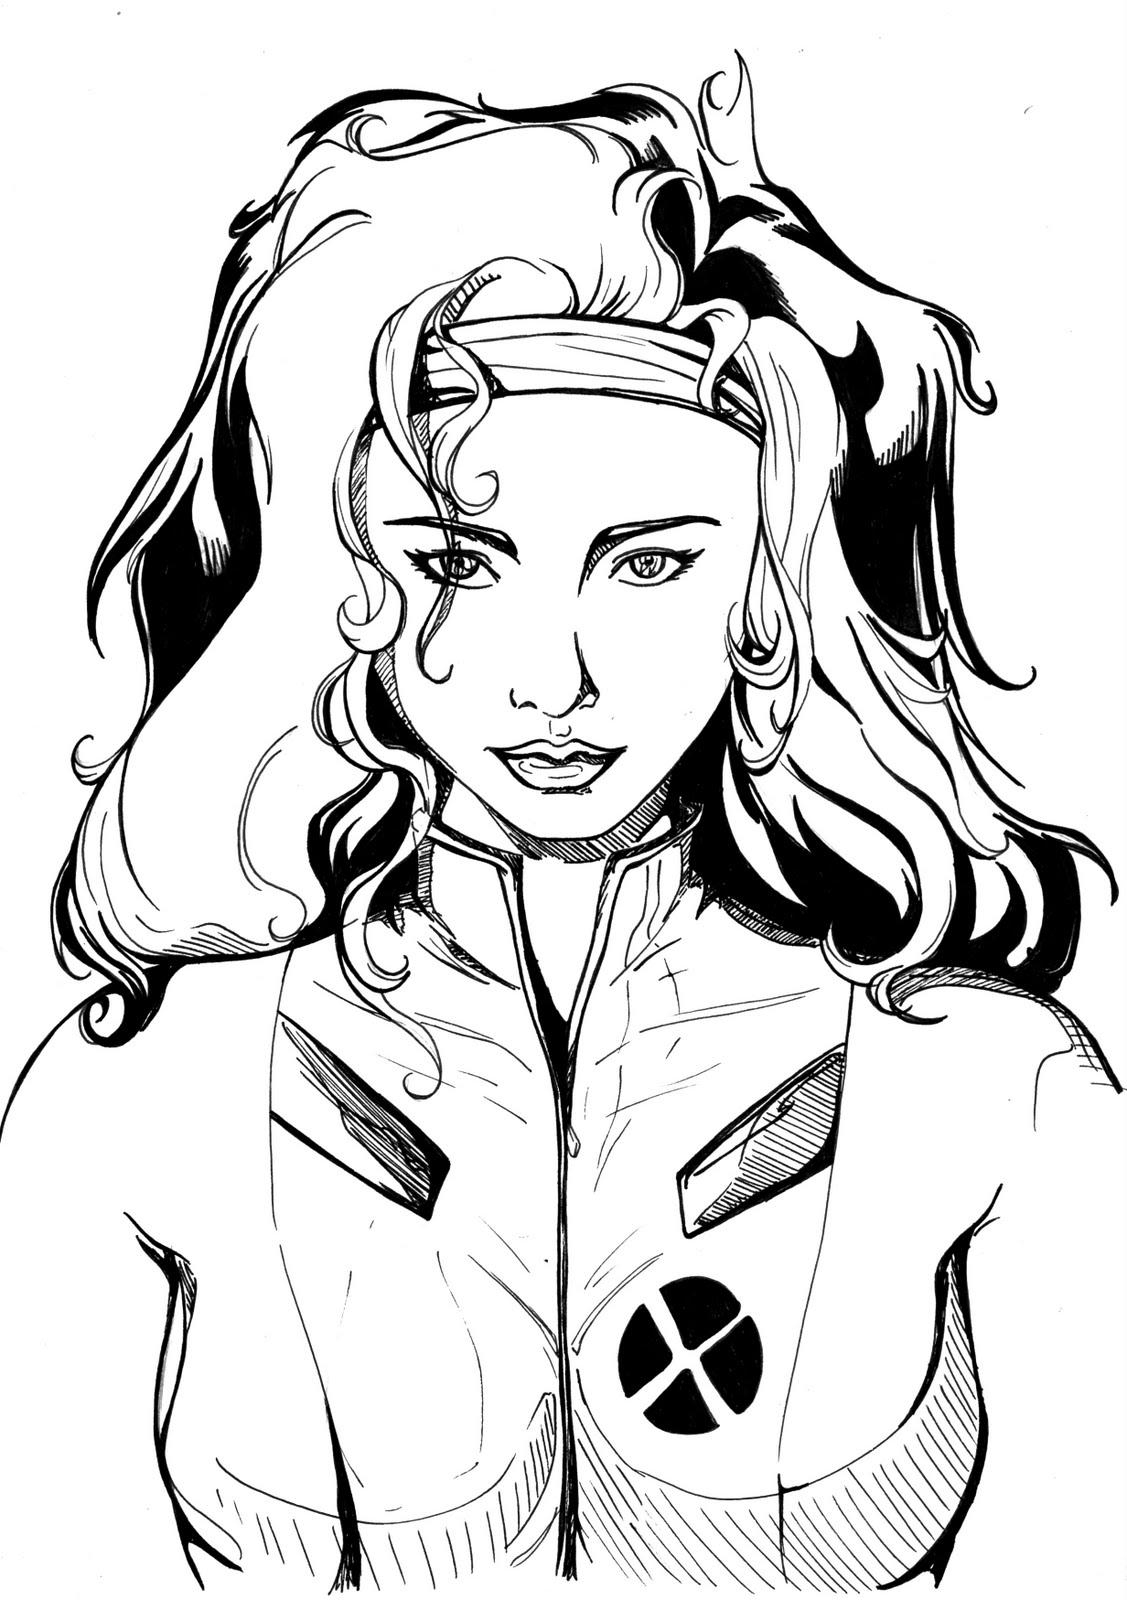 imagem pintar vampira Desenhos para Colorir do X Men: Wolverine, Vampira, Ciclope etc Online